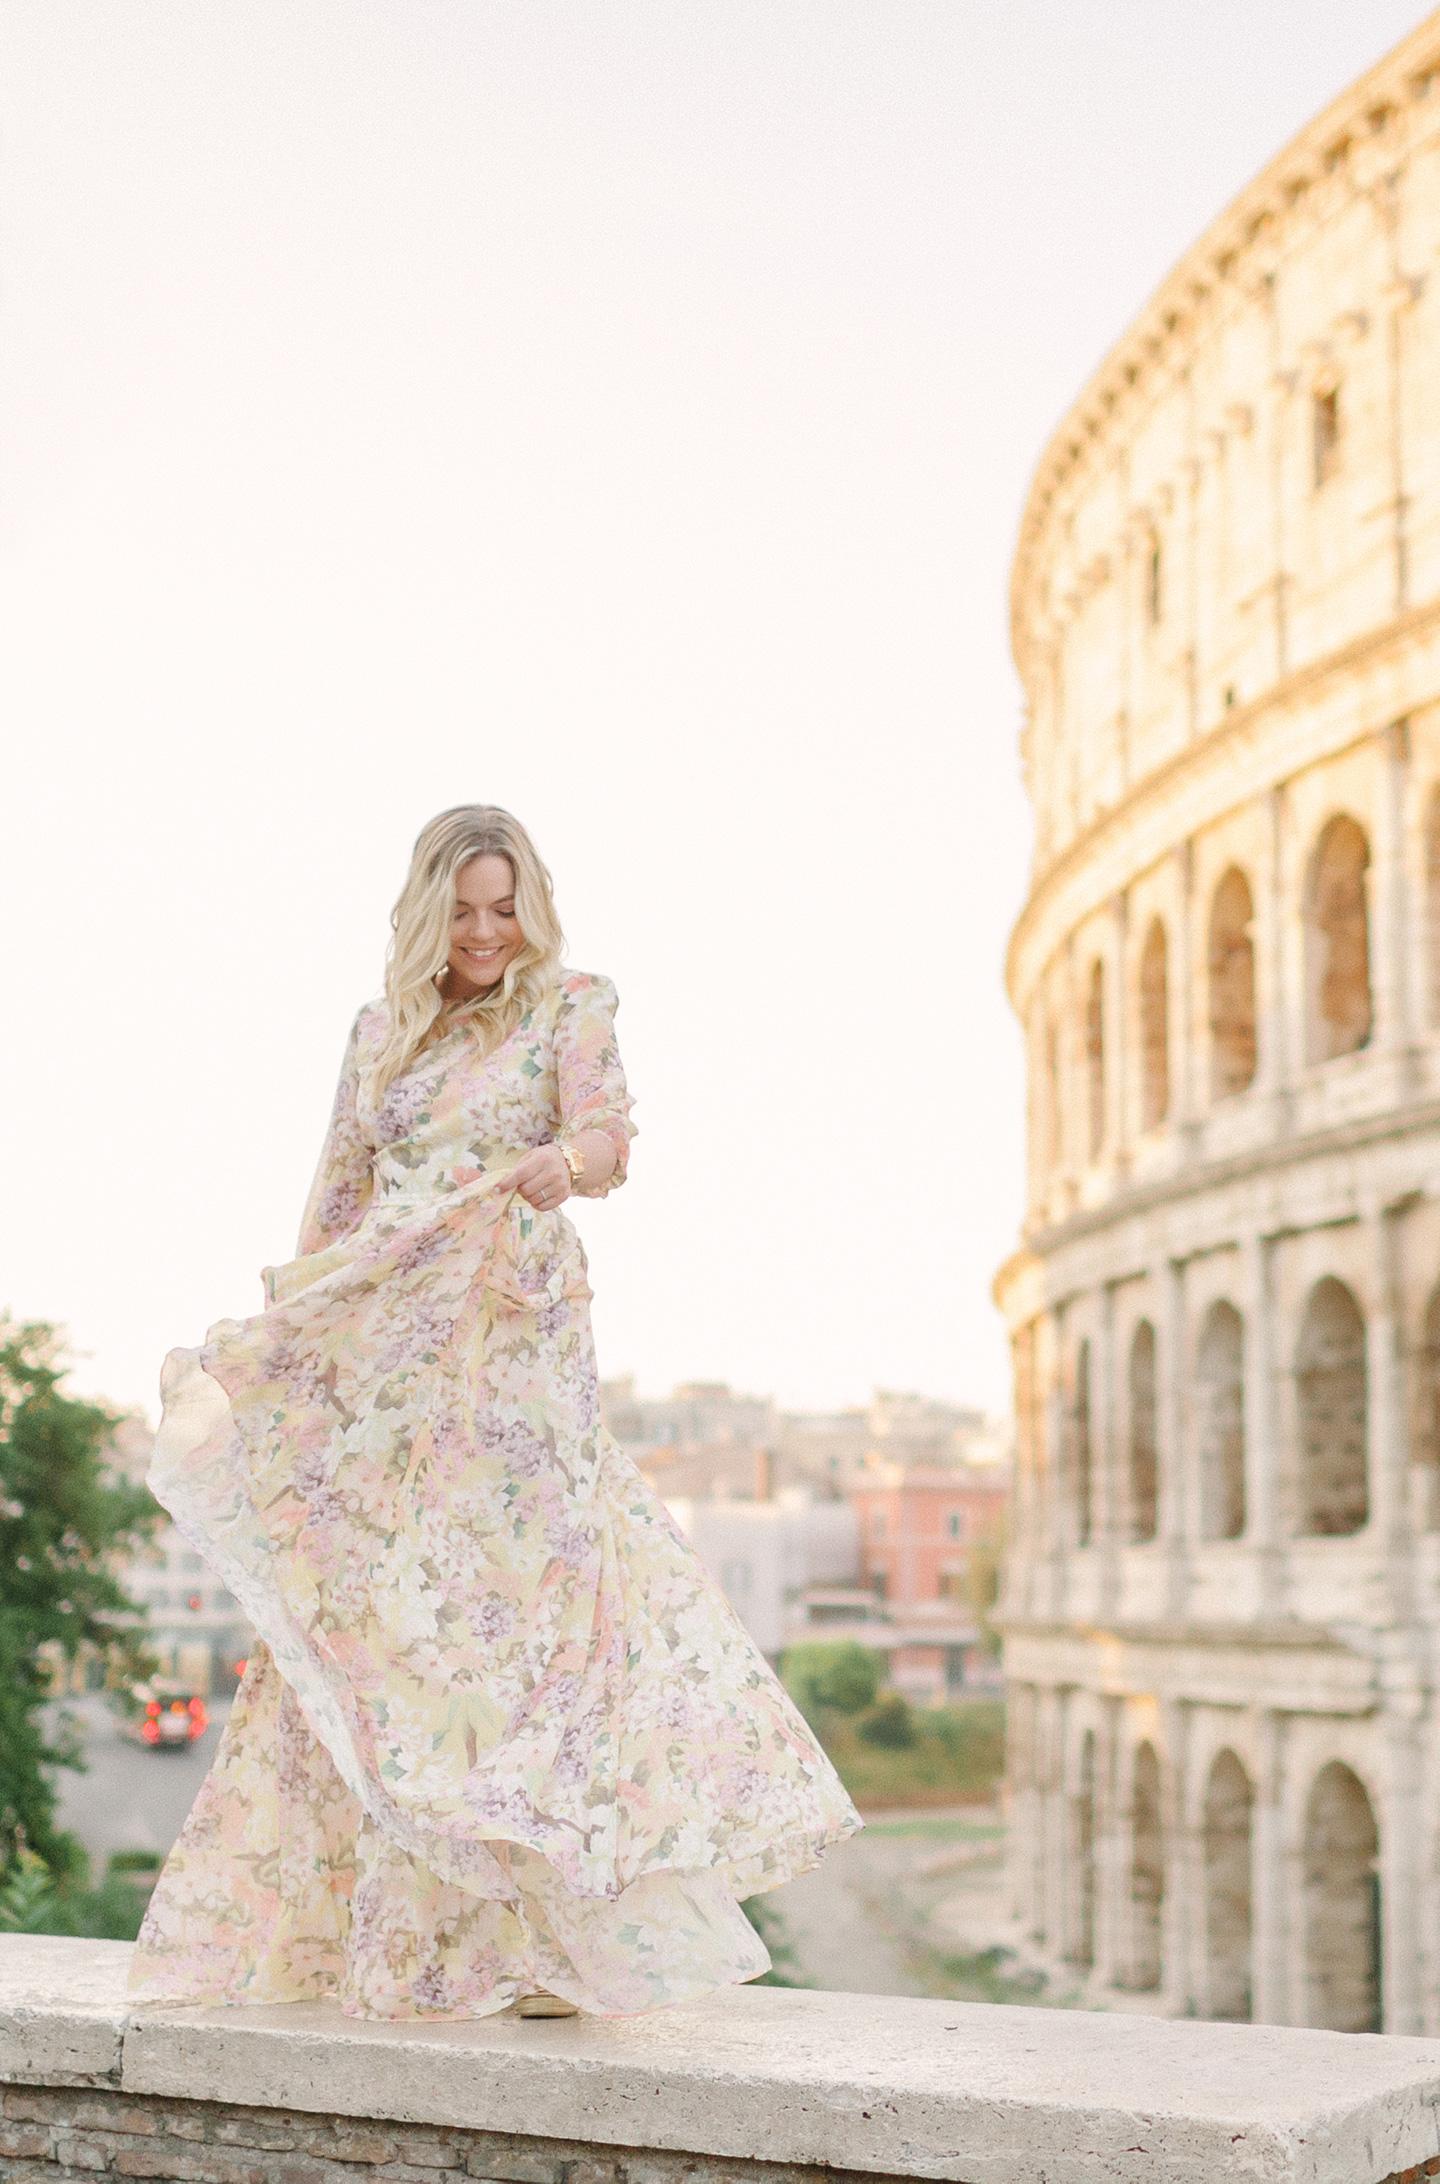 Yumi Kim at the Colosseum